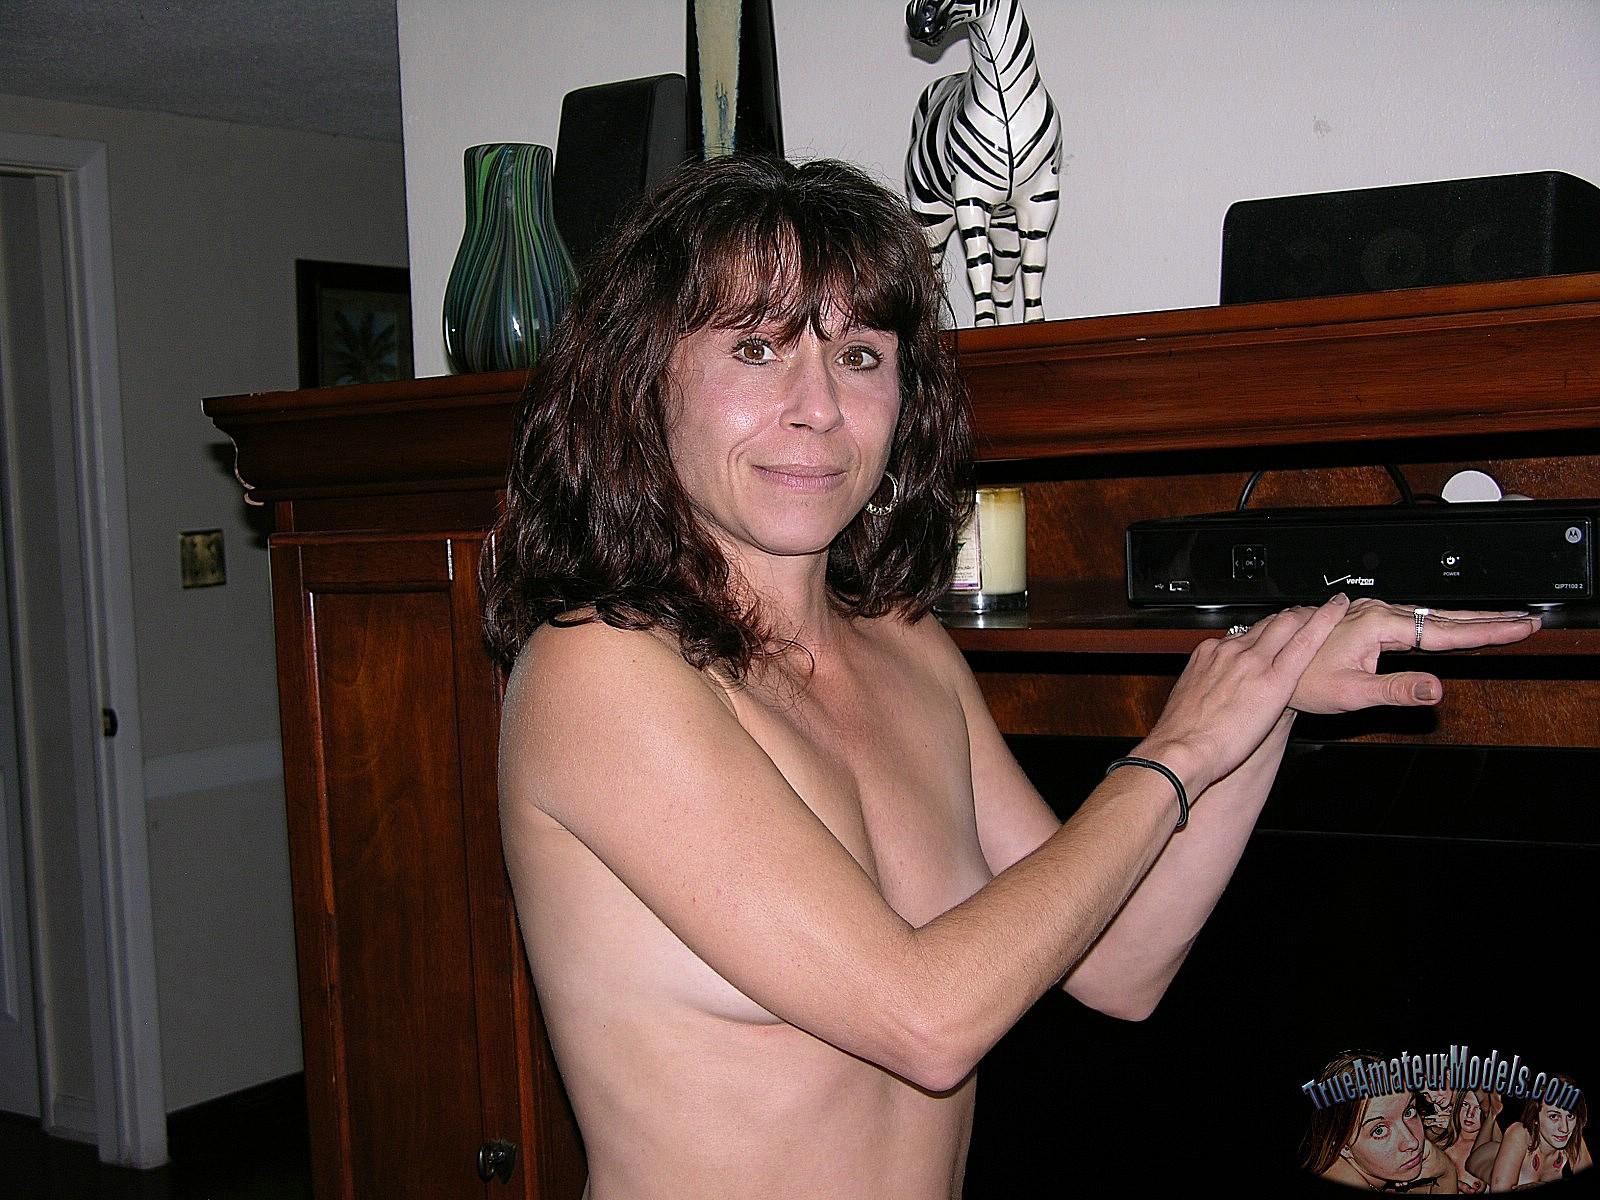 Soccer mom nude